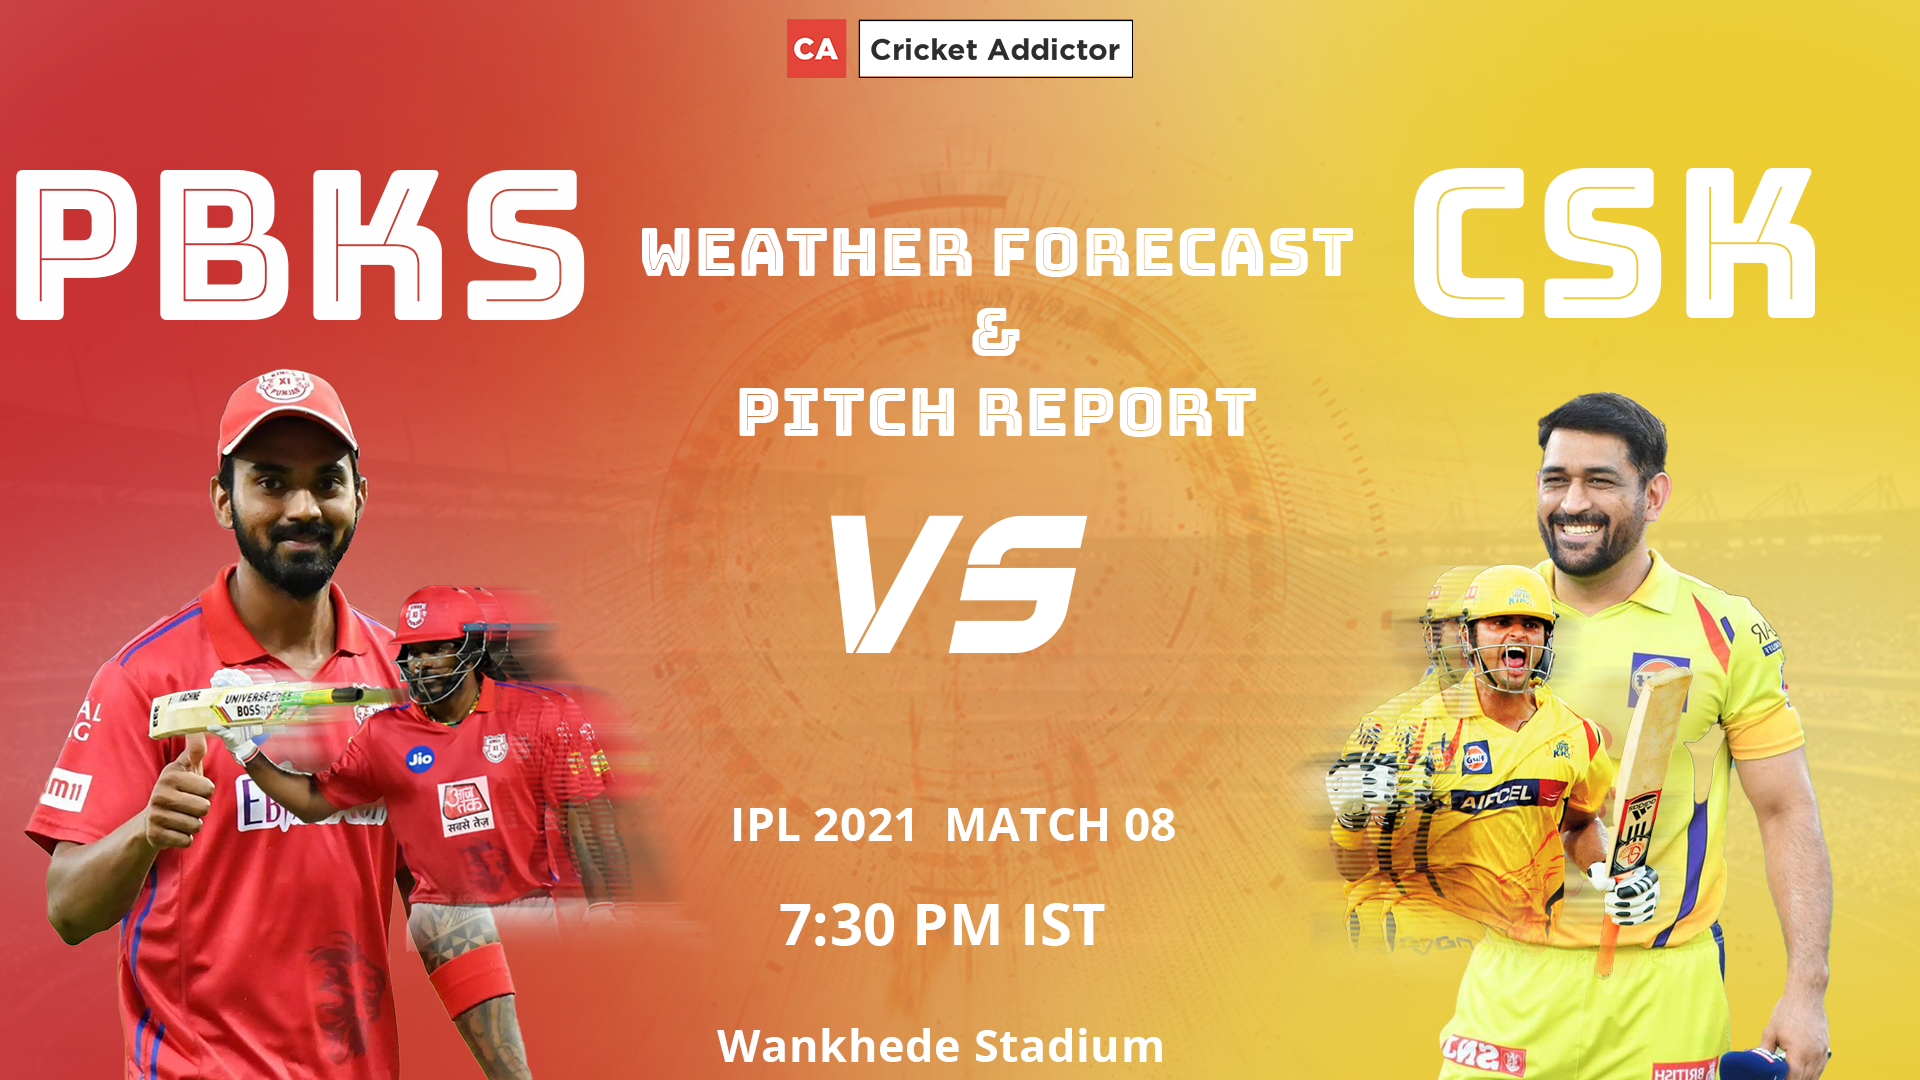 IPL 2021, Punjab Kings, Chennai Super Kings, PBKS vs CSK, Weather, Pitch, Mumbai, Wankhede Stadium